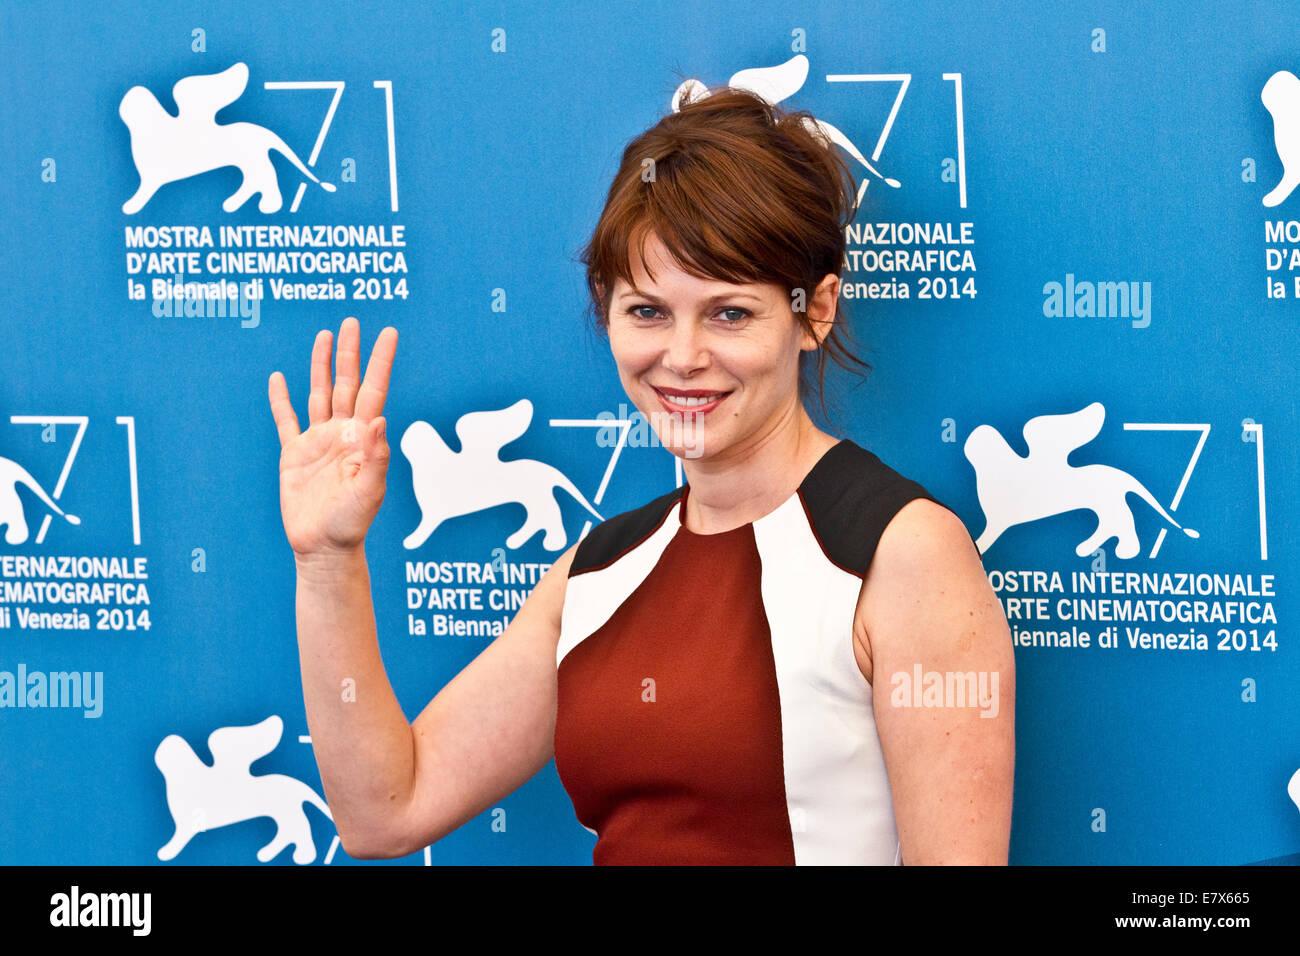 d03998b6652 Italy Veneto Venice Festival of the Cinema 2014 Barbora Bobulova actress -  Stock Image